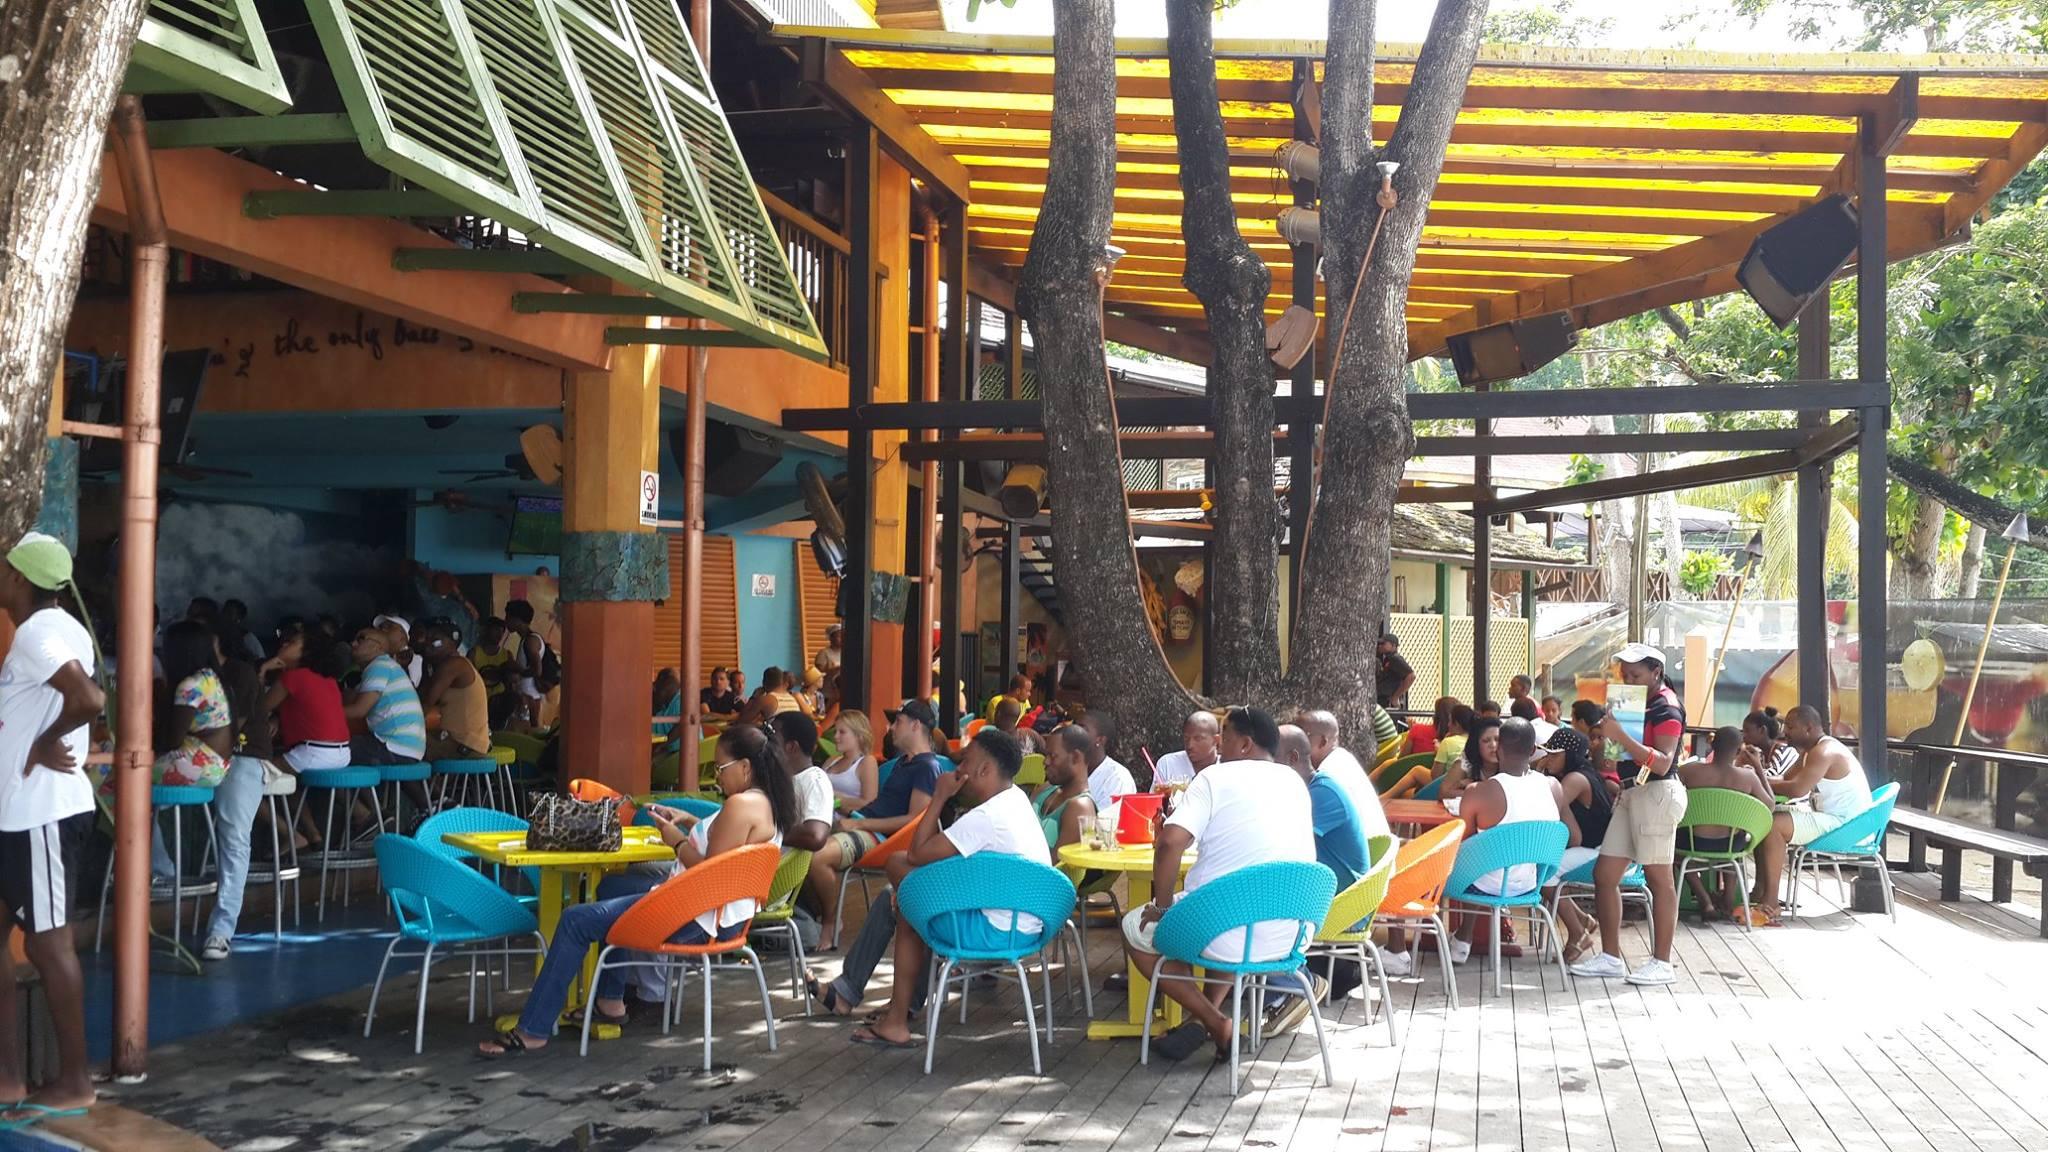 restaurants in ocho rios 2400, best restaurants in ocho rios 170, ocho rios food, where to eat in ocho rios, Jimmy Buffett's Margaritaville